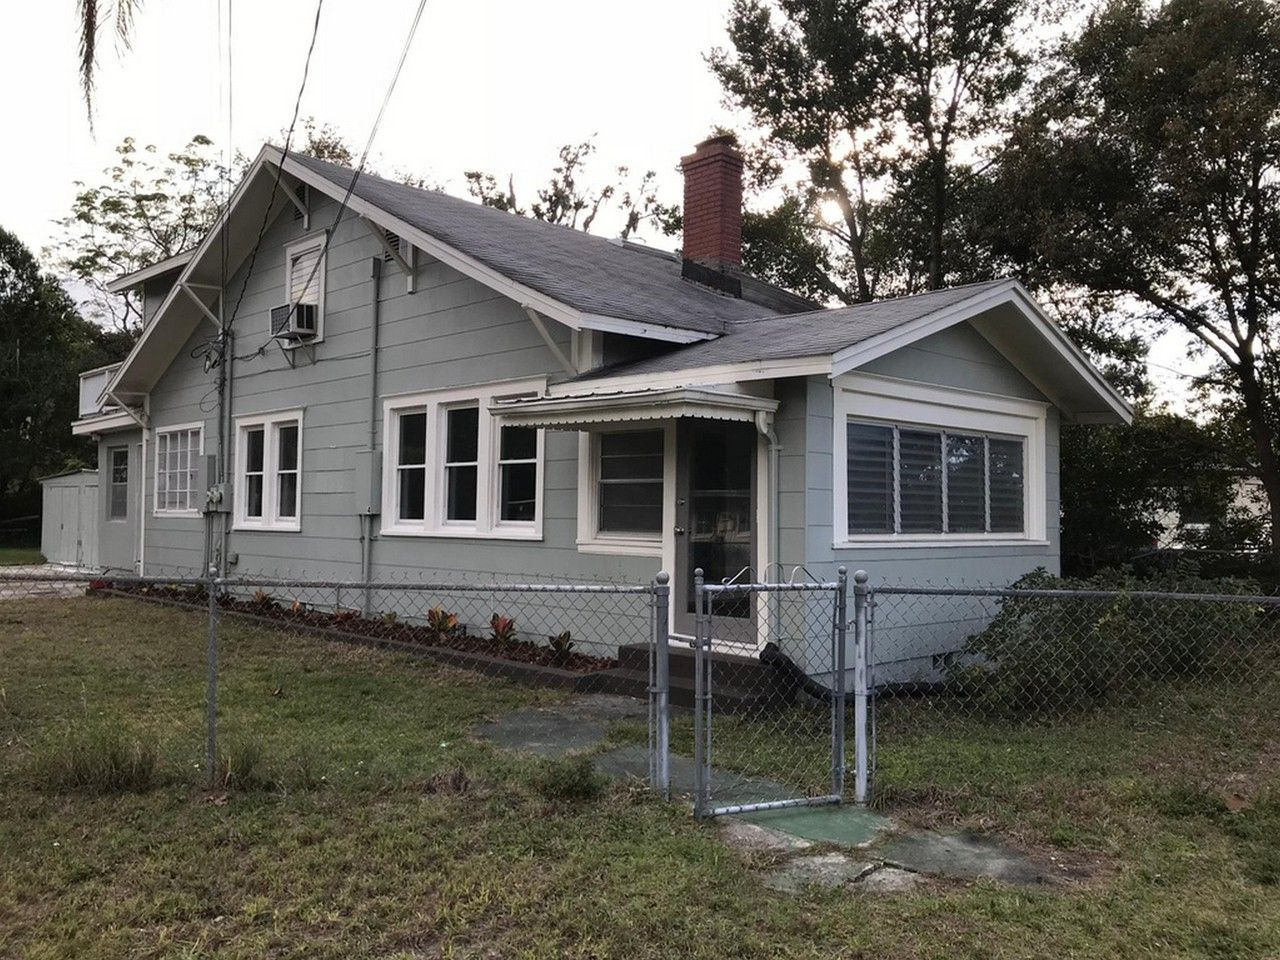 2 West Evans Street, Orlando, FL 32804 2 Bedroom Apartment ...